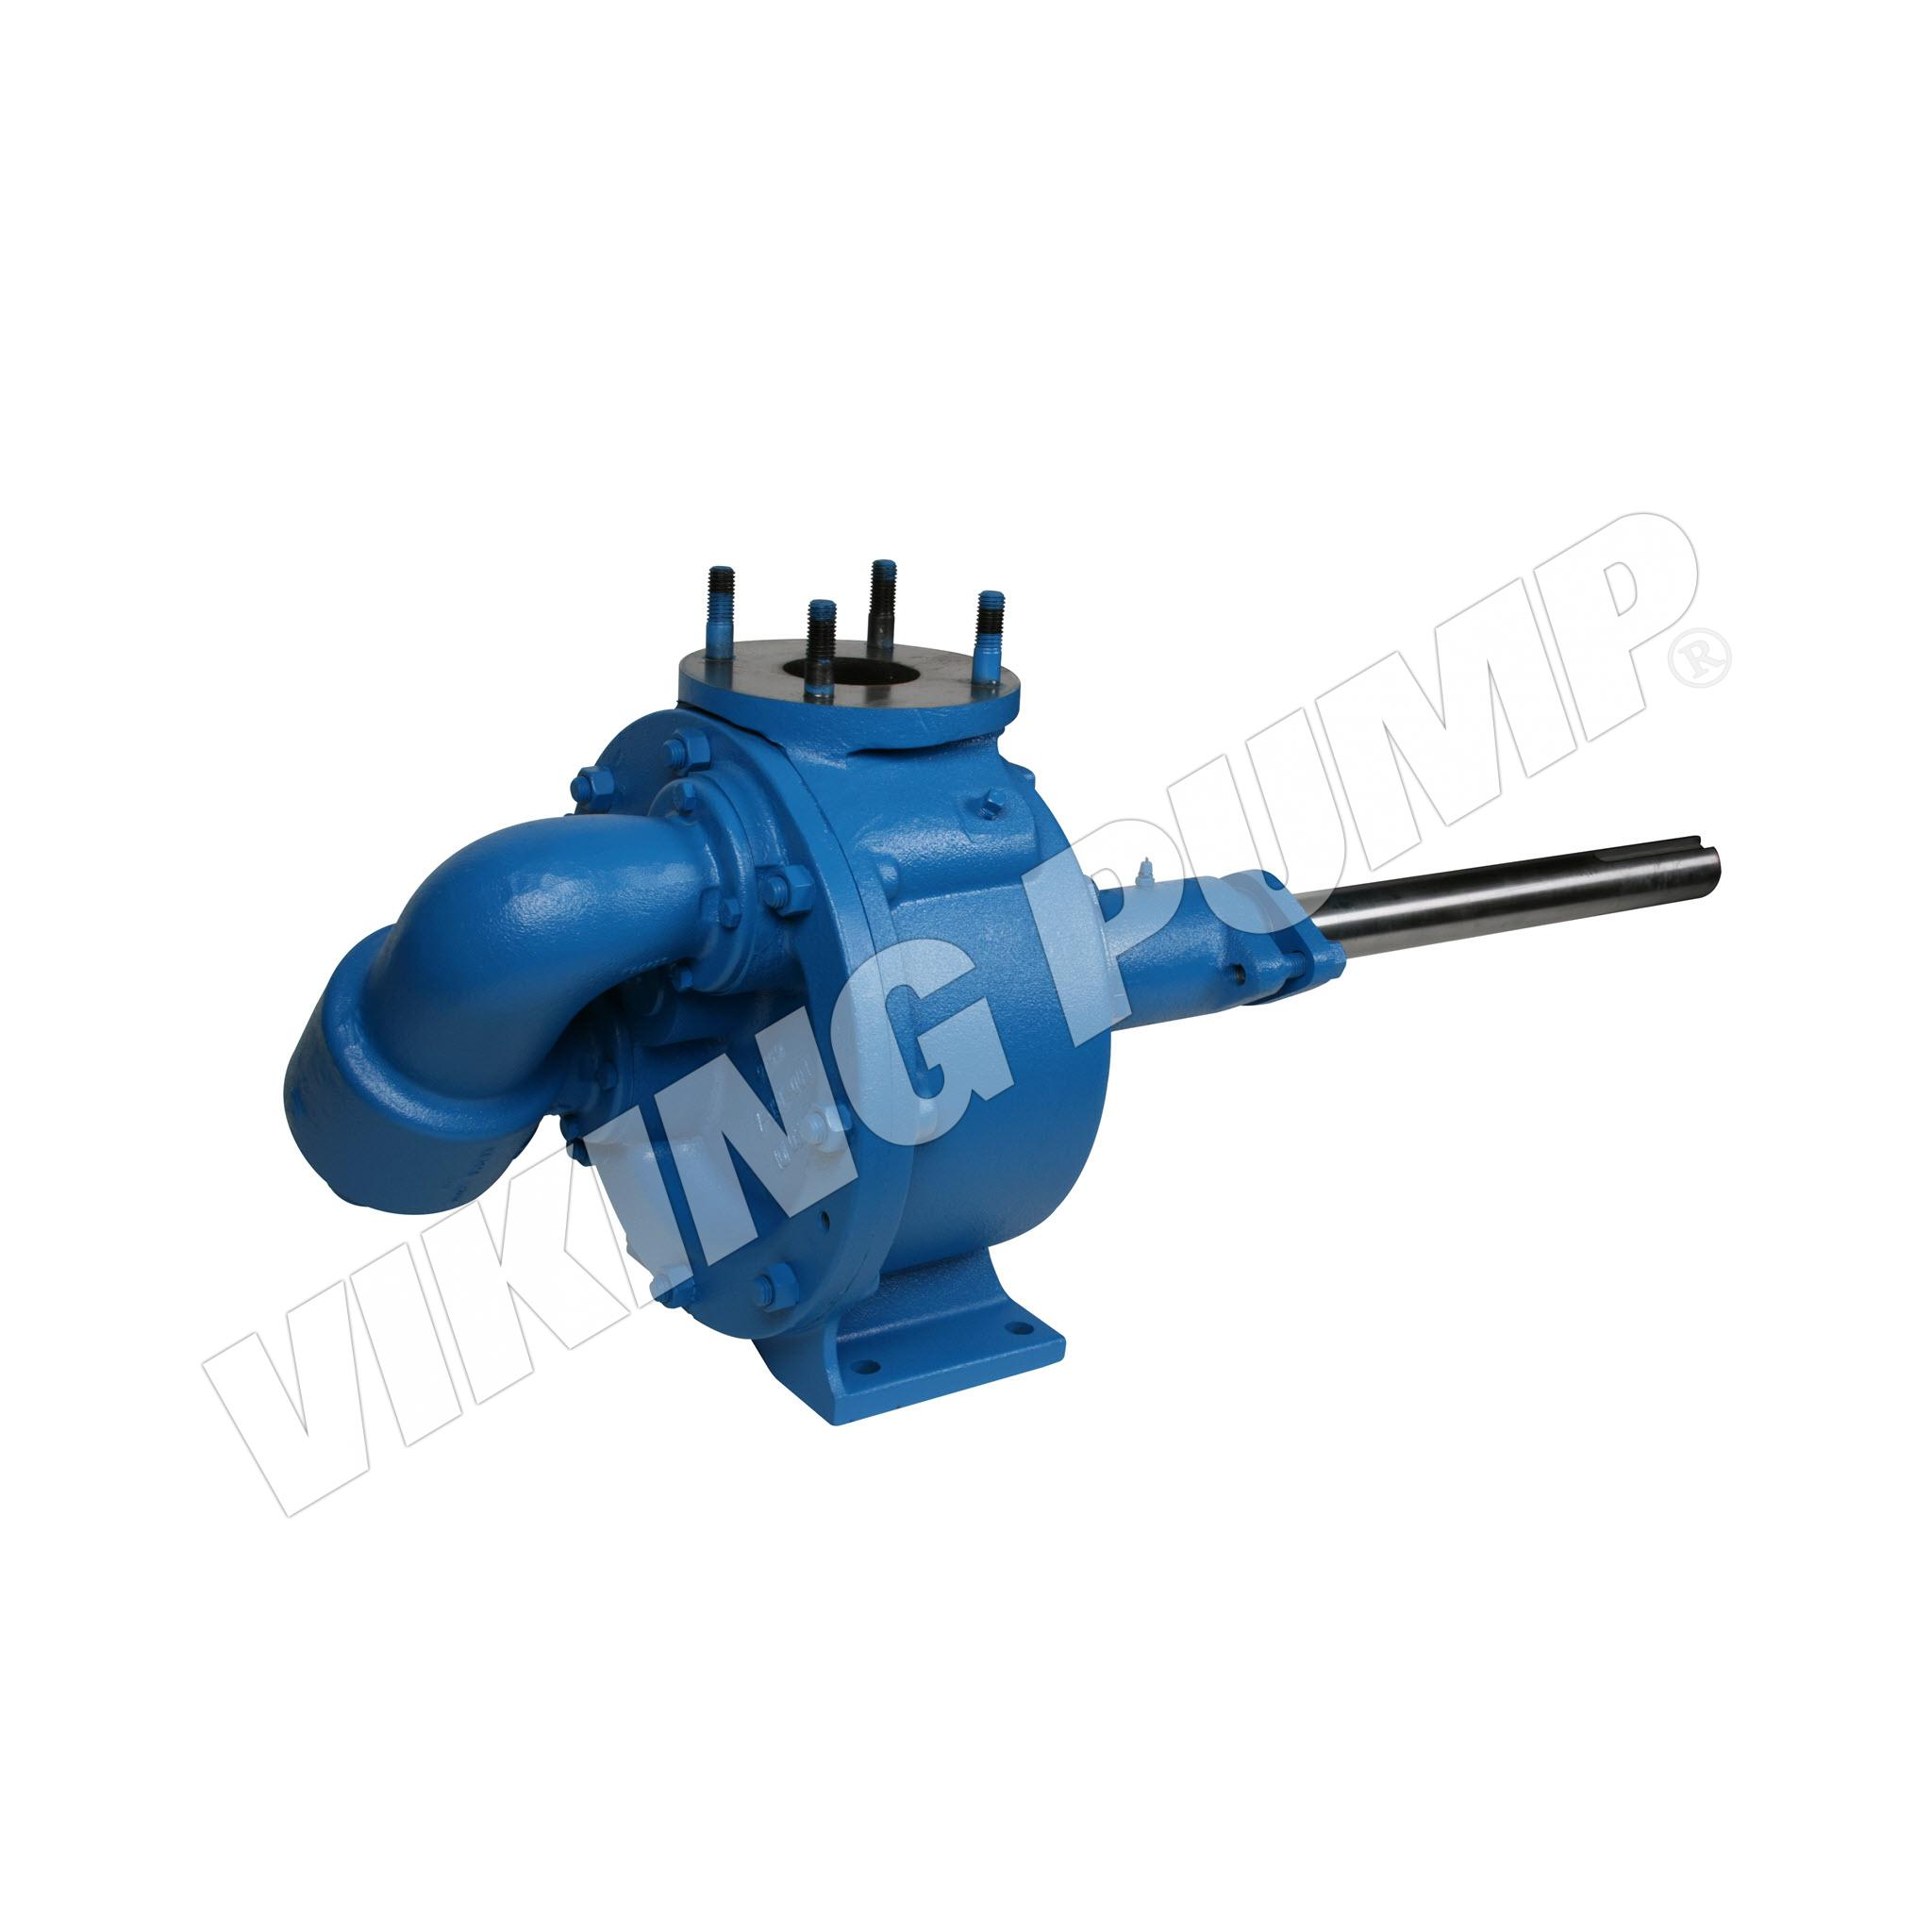 Model Q32, Relief Valve, Flange Port Pump